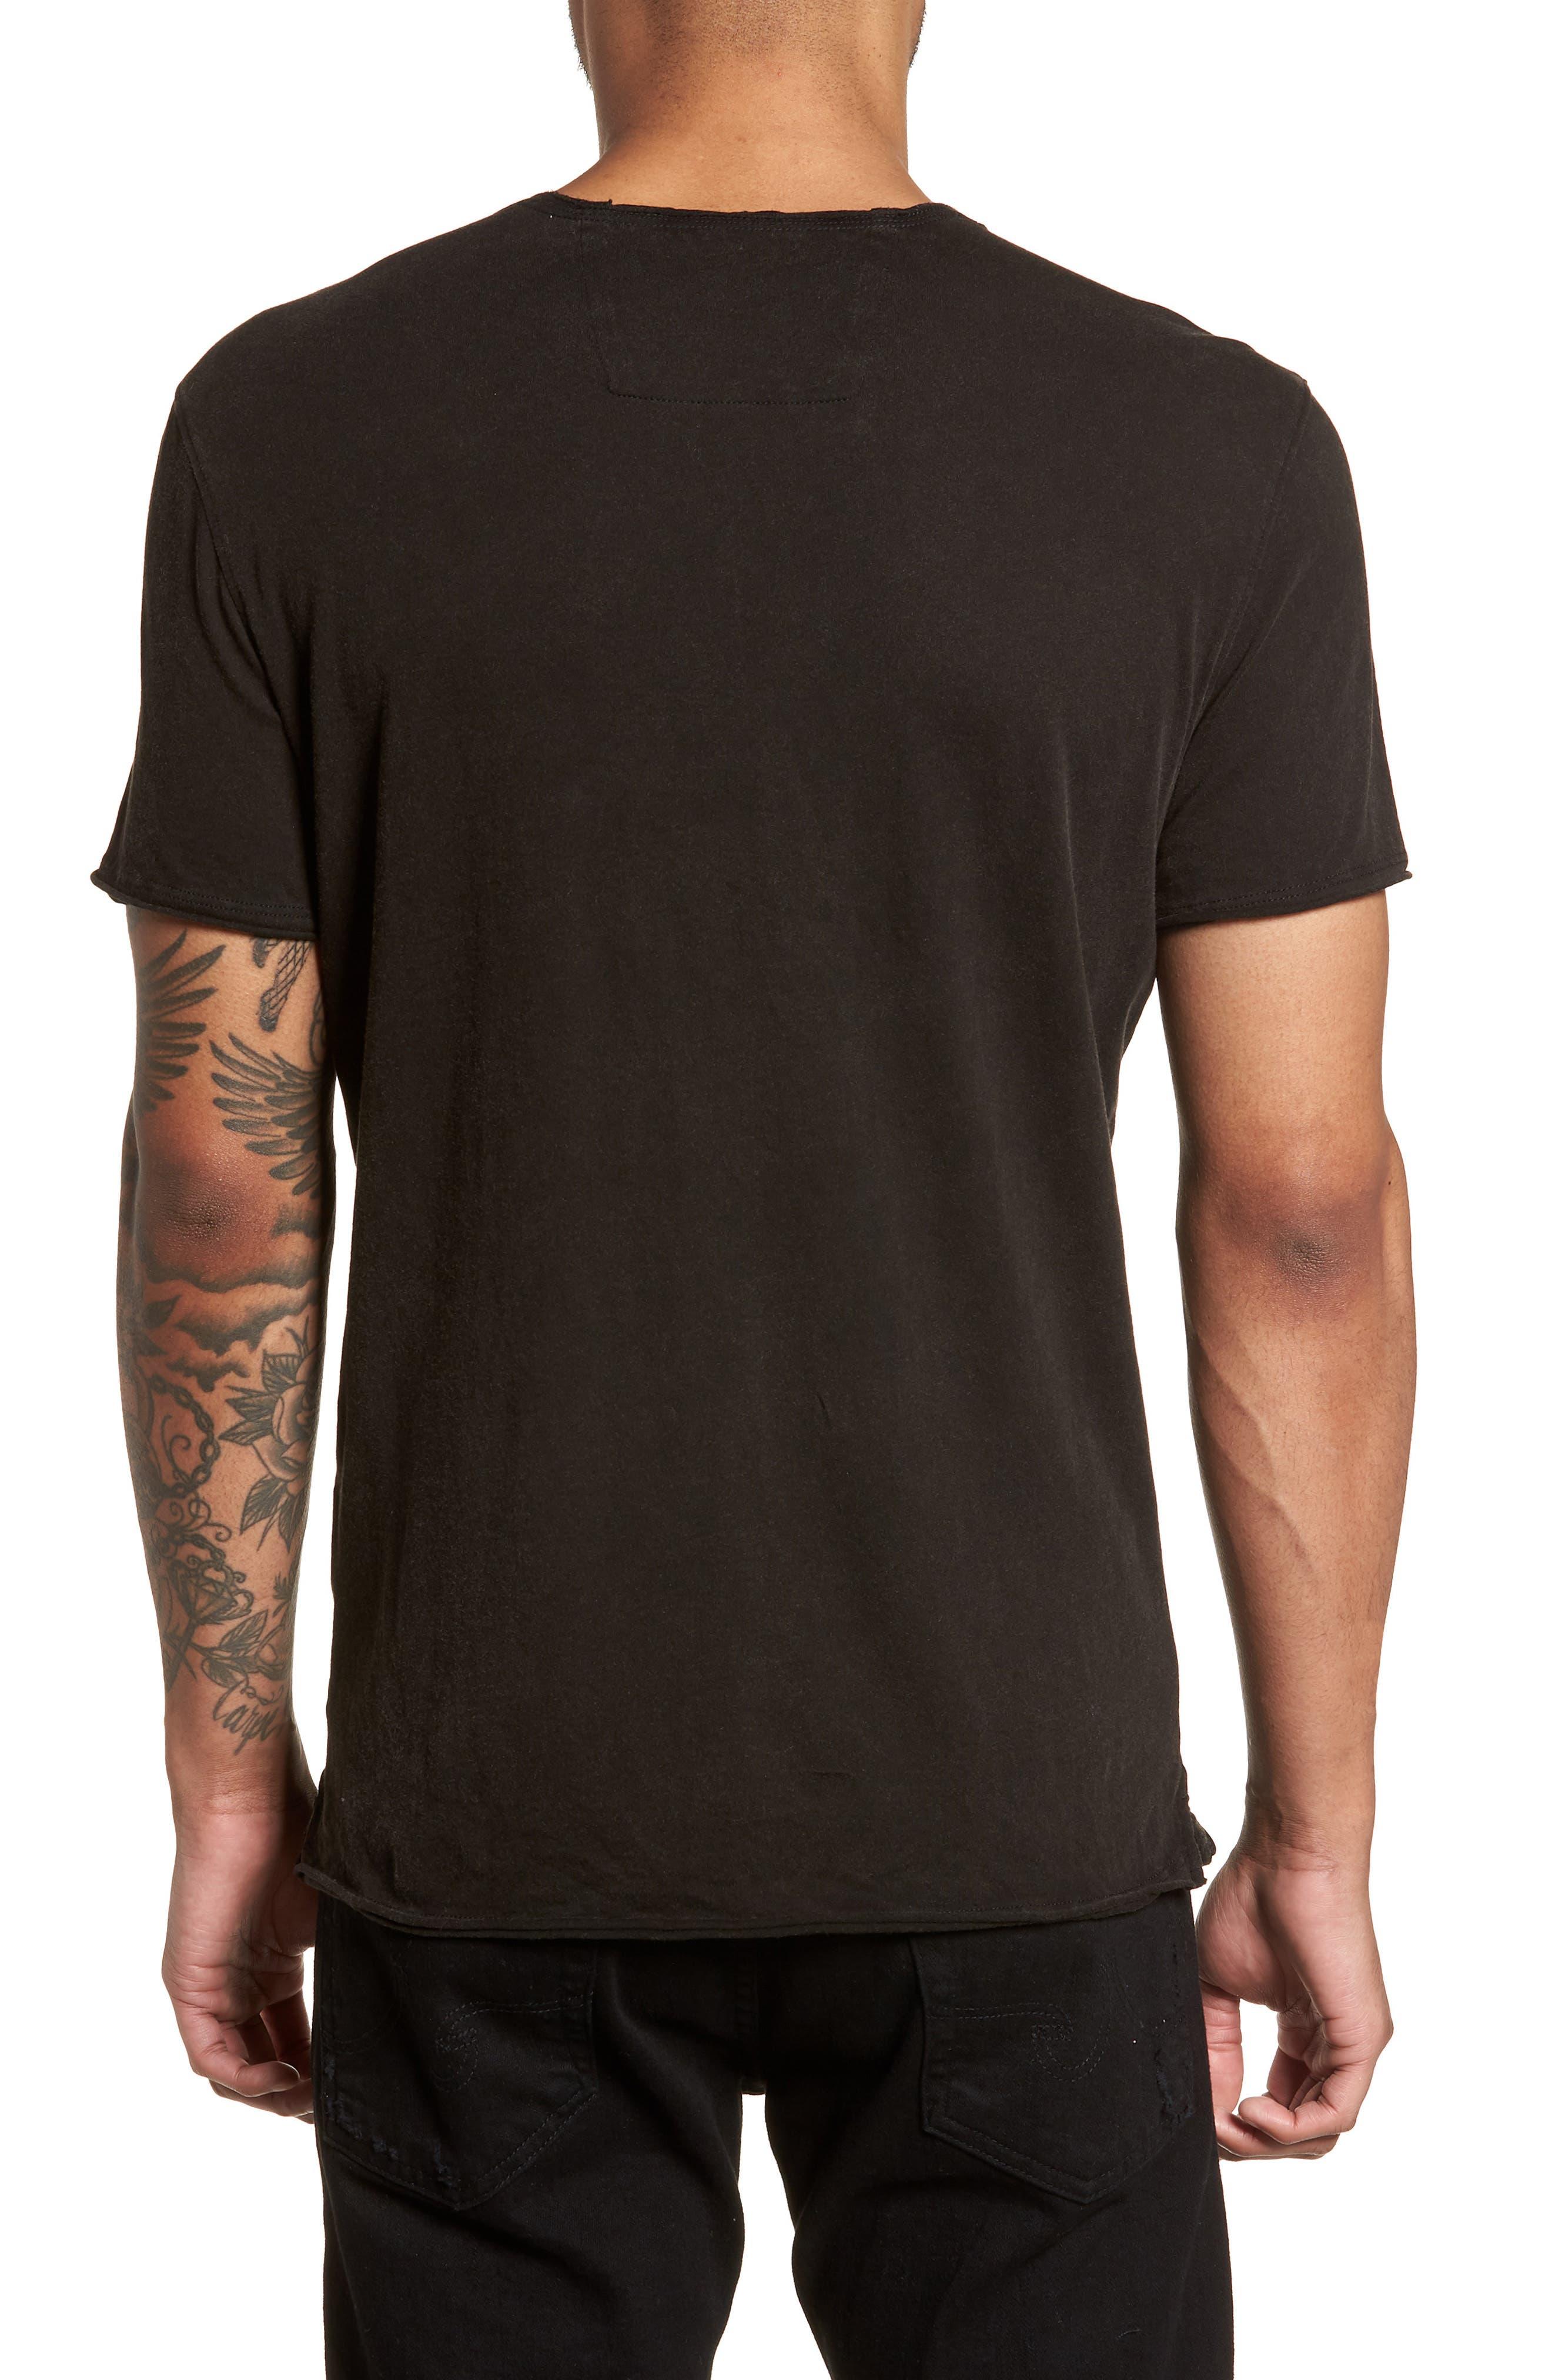 Lust or Bust T-Shirt,                             Alternate thumbnail 2, color,                             001